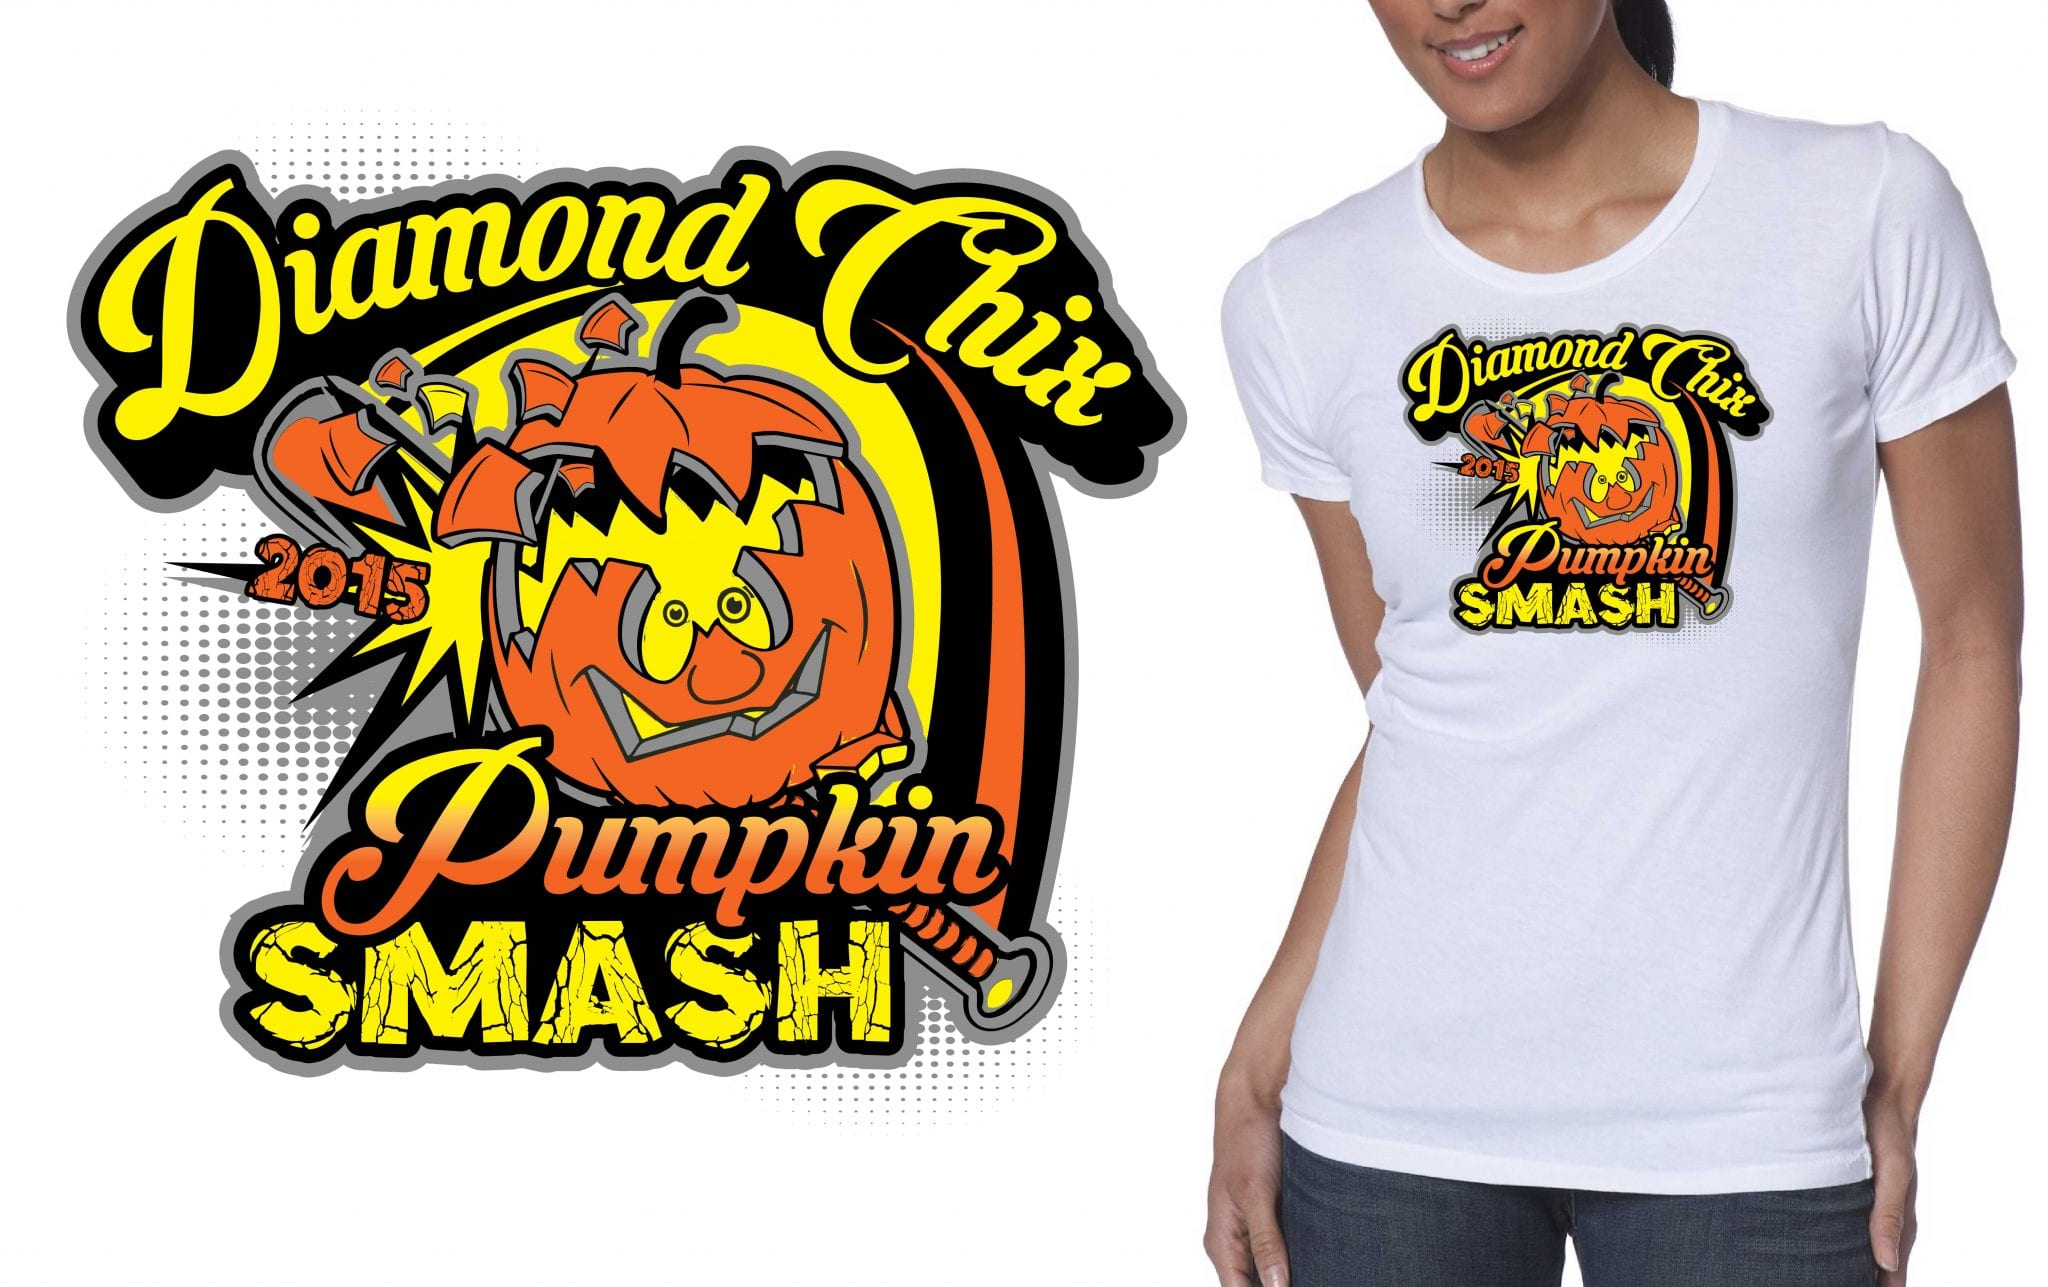 Diamond Chix Pumpkin Smash crazy tshirt logo design 2